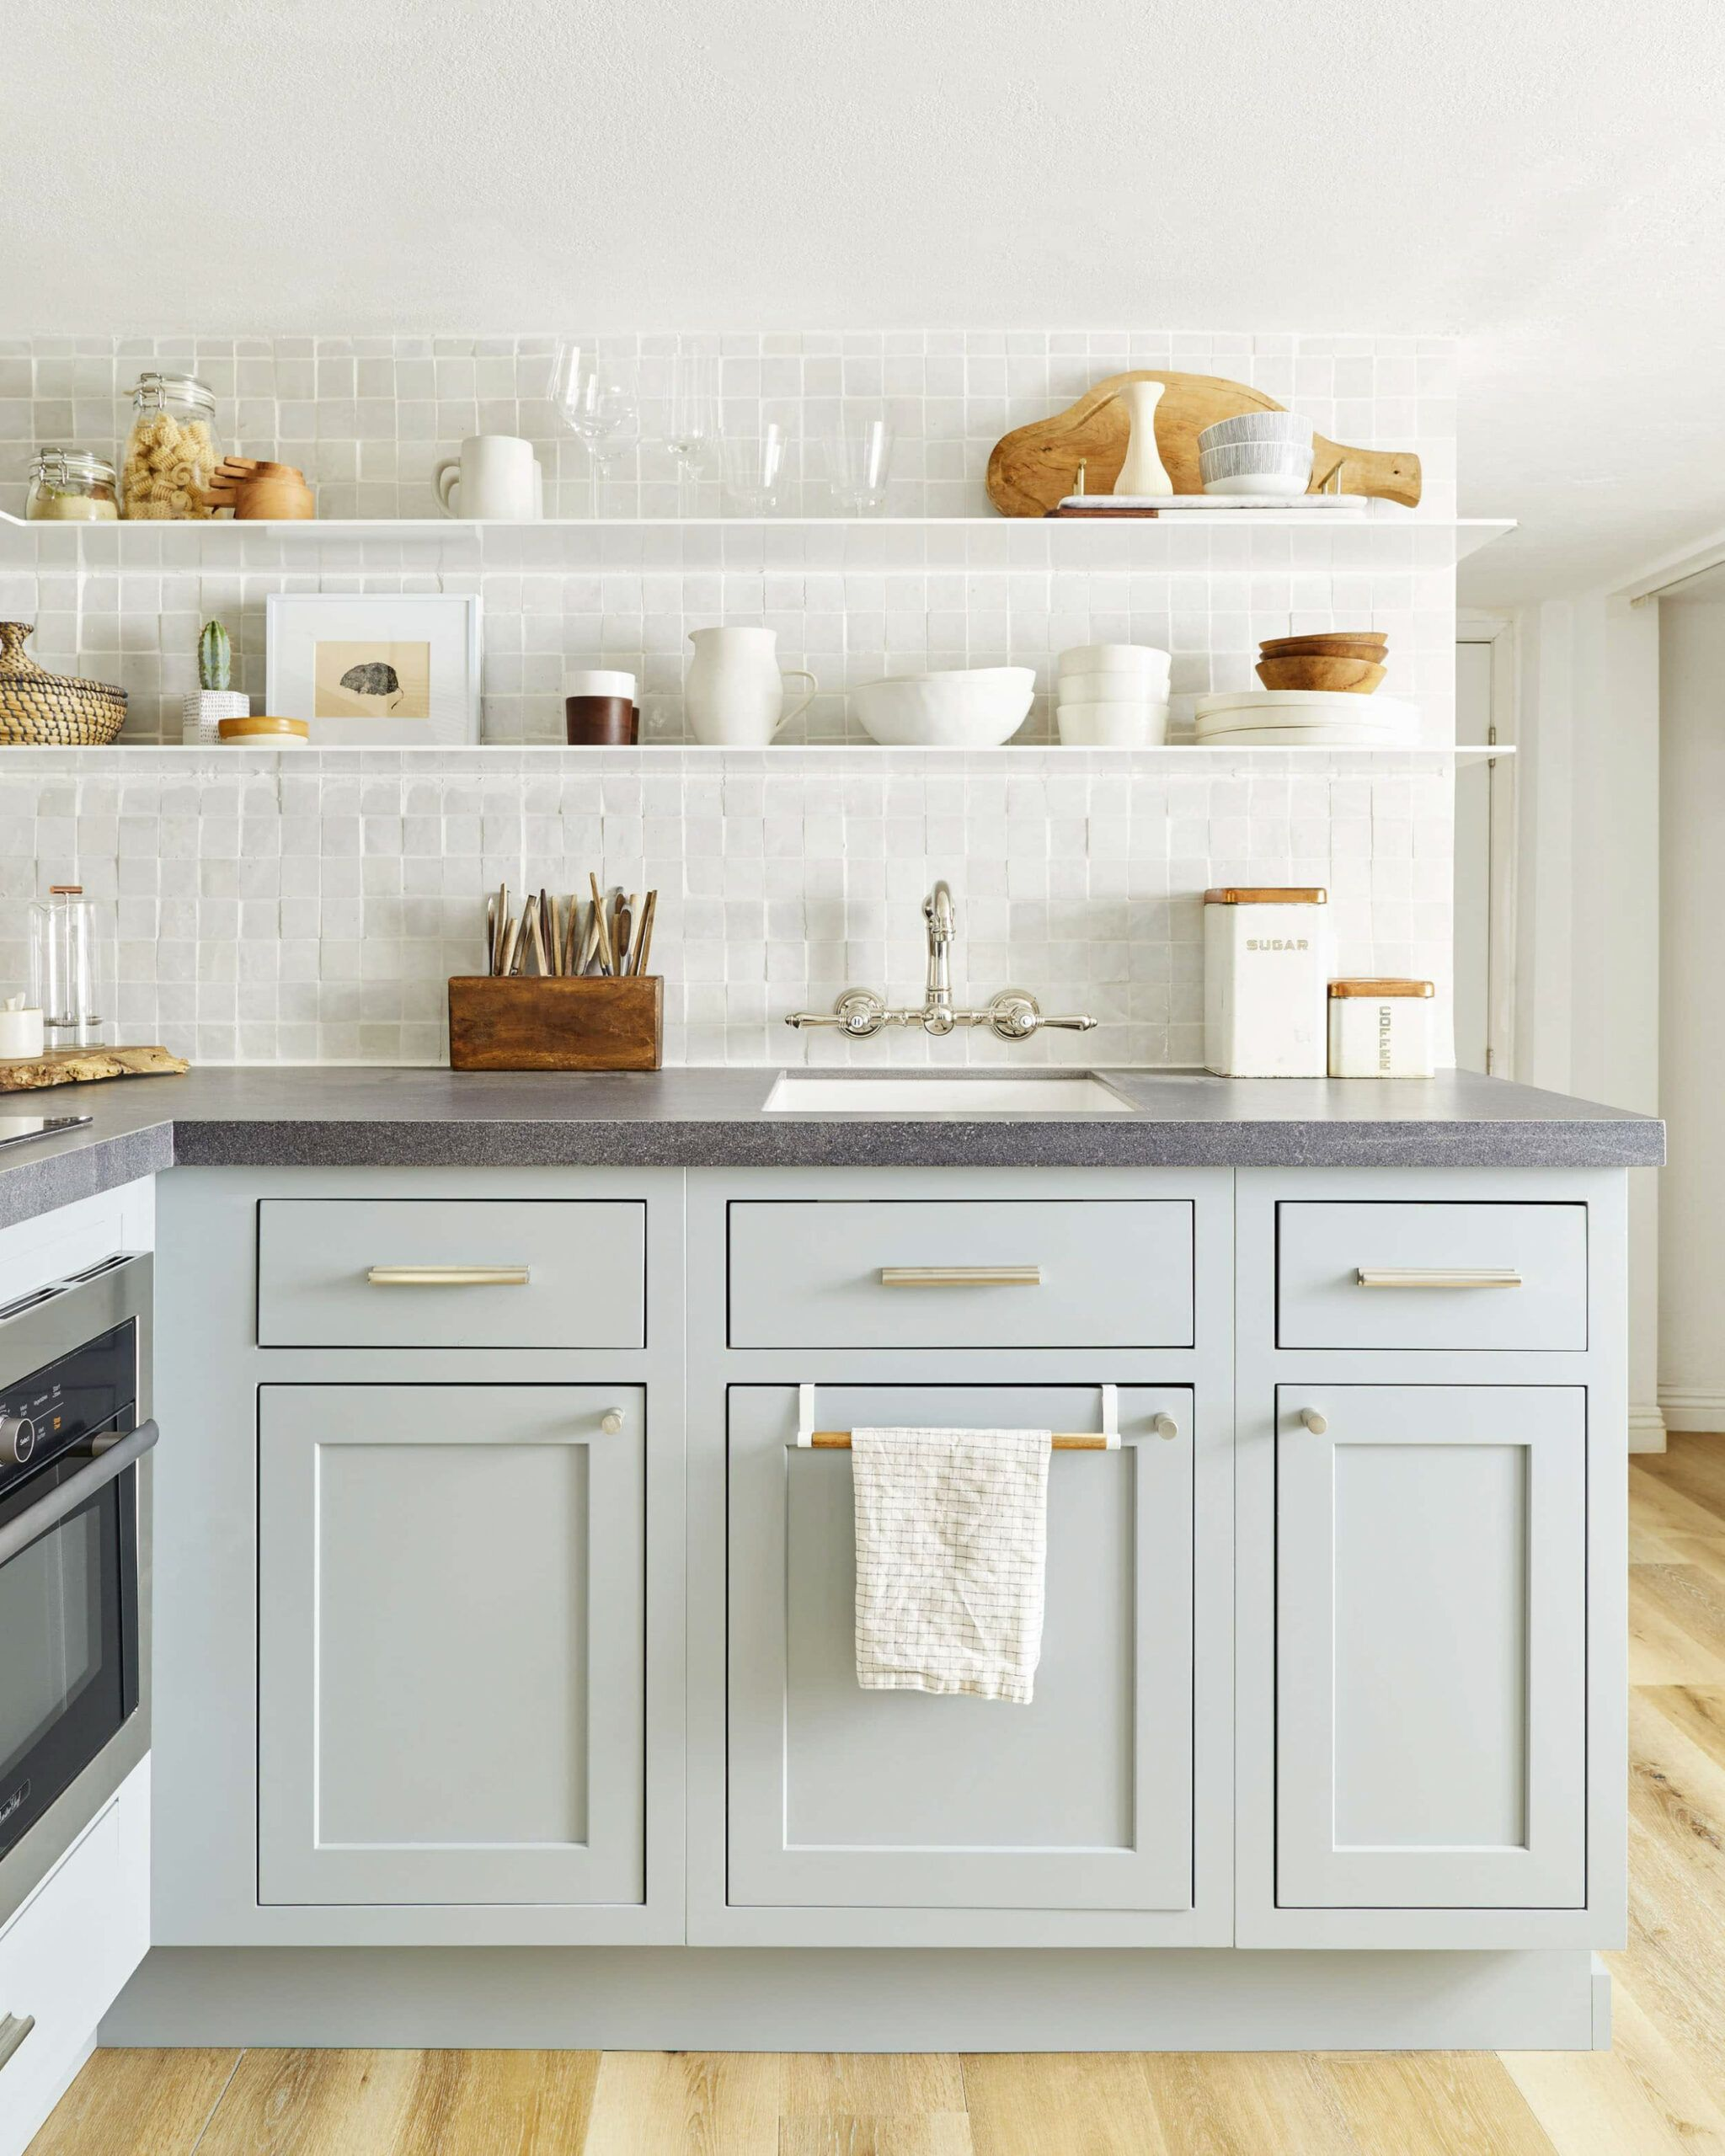 9 5 Inch Pulls For Kitchen Cabinets Di 2020 Dapur Interior Warna Cat